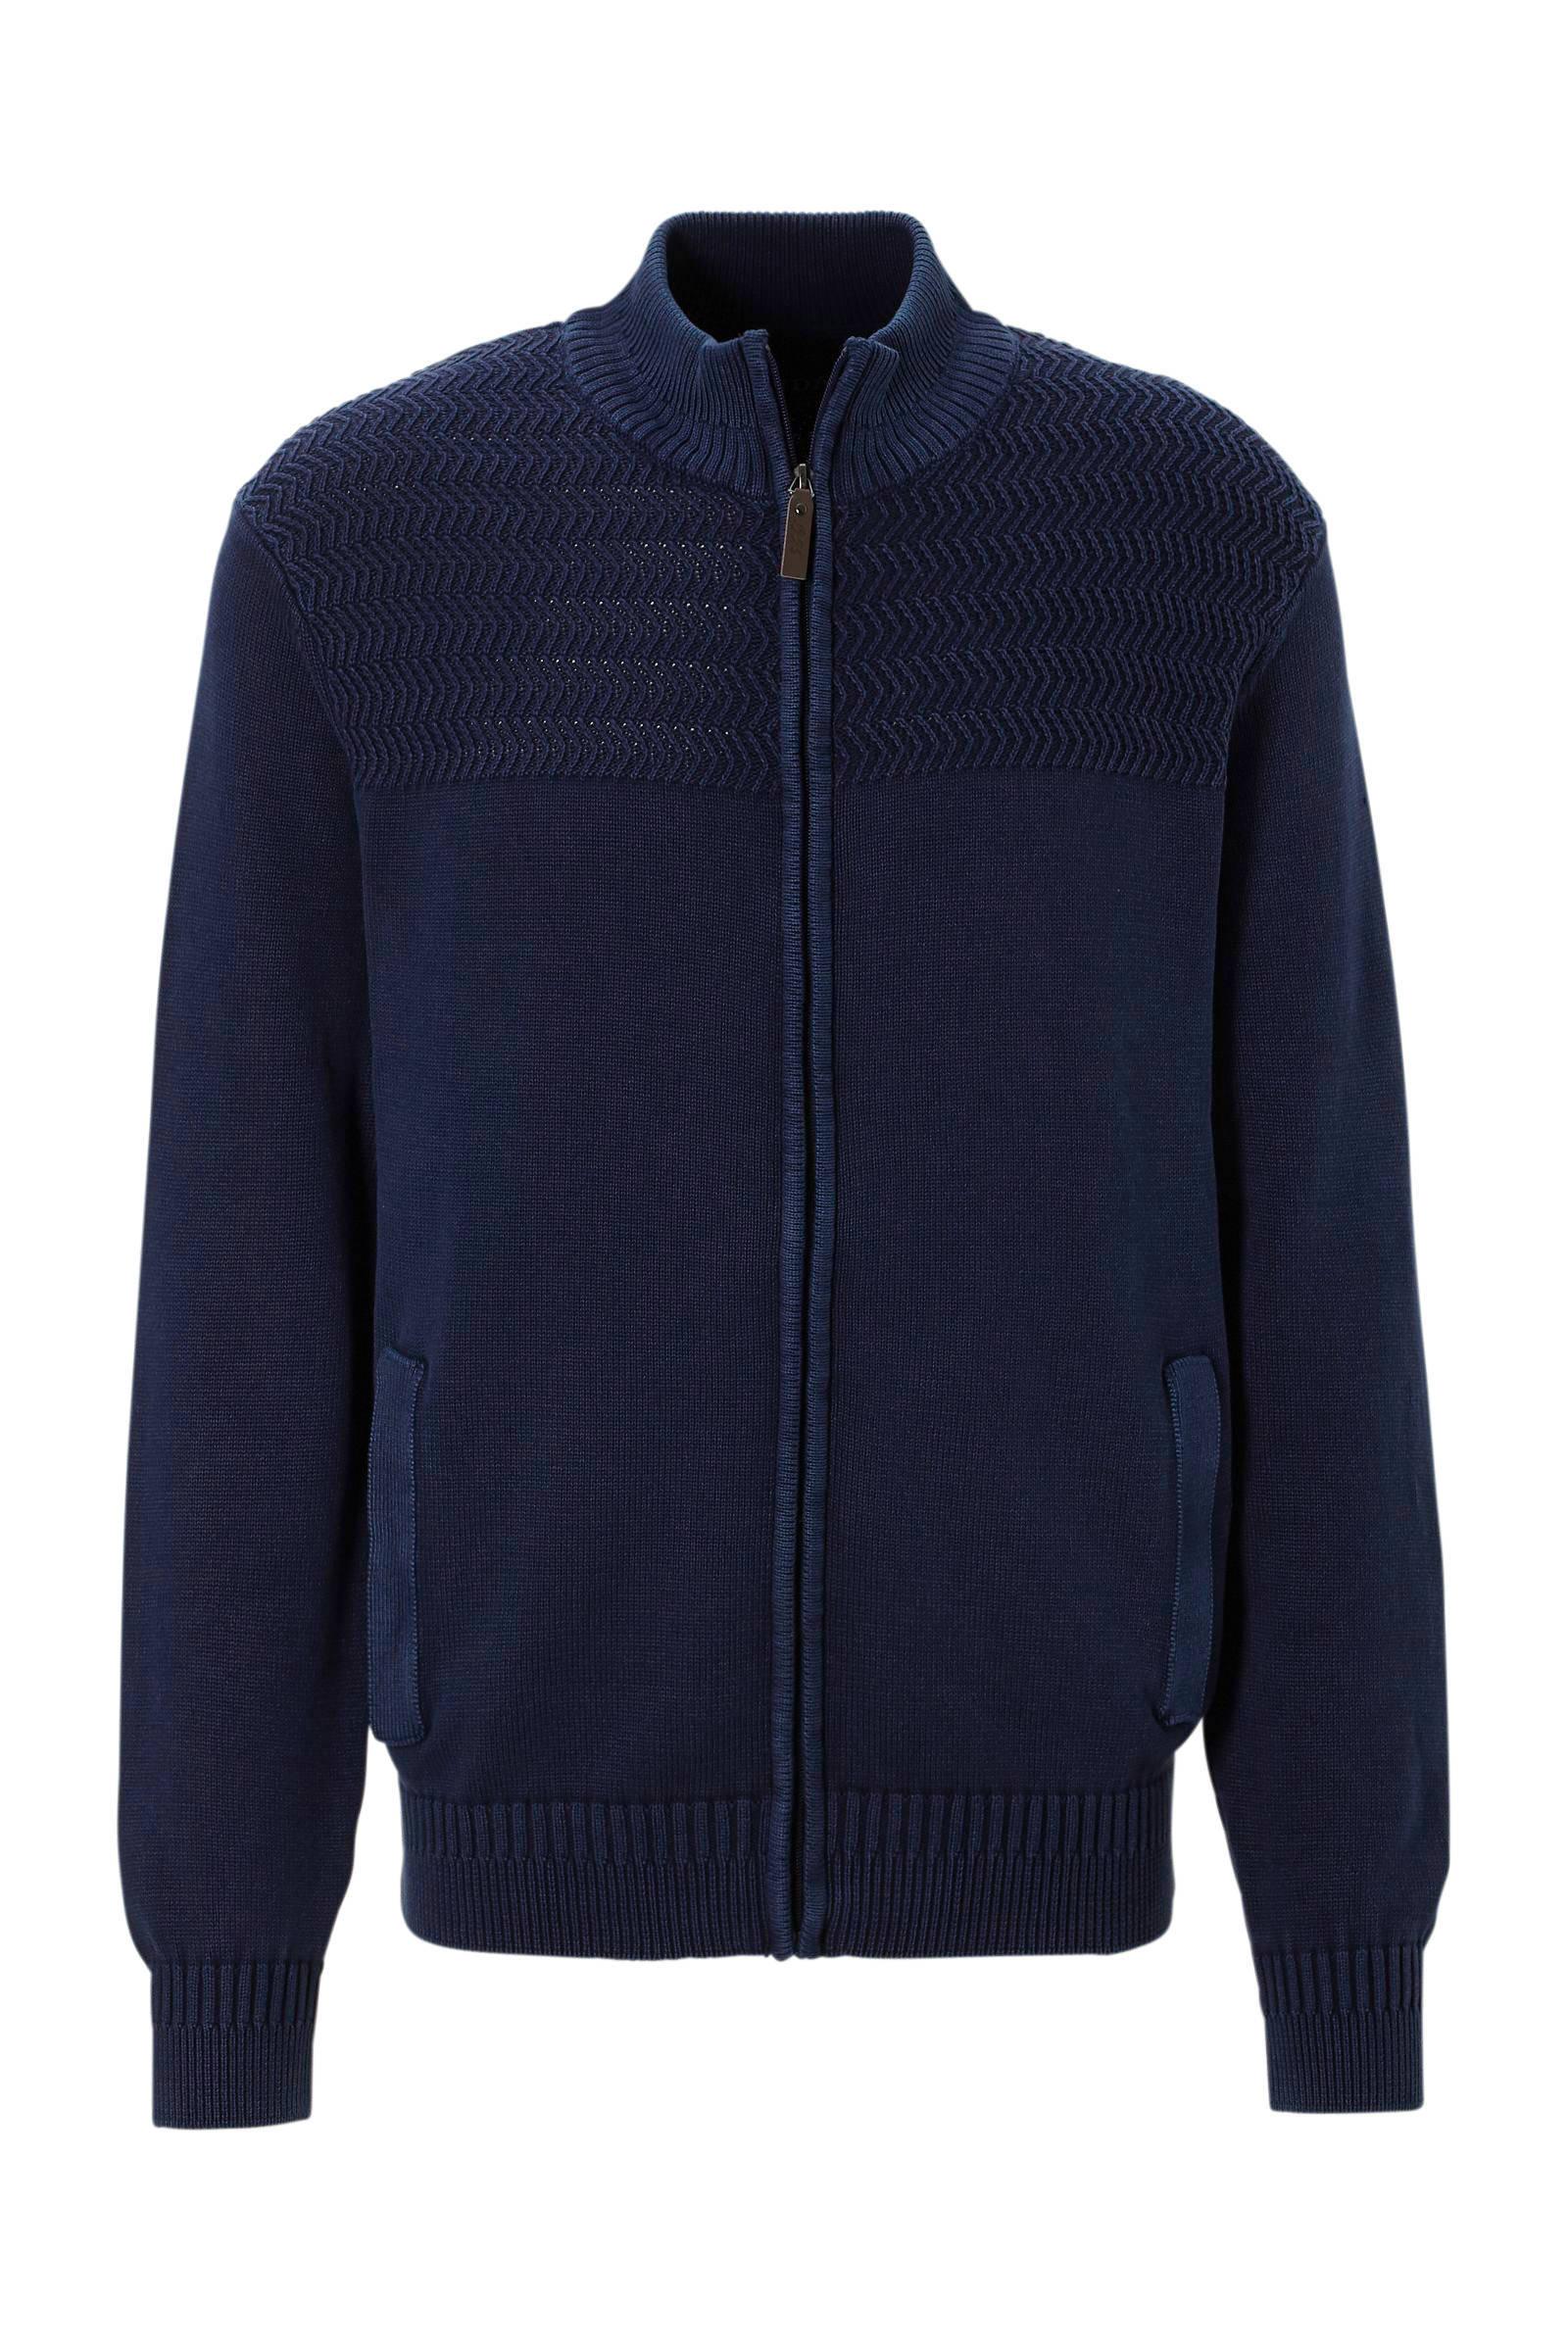 C&A Canda vest blauw   wehkamp